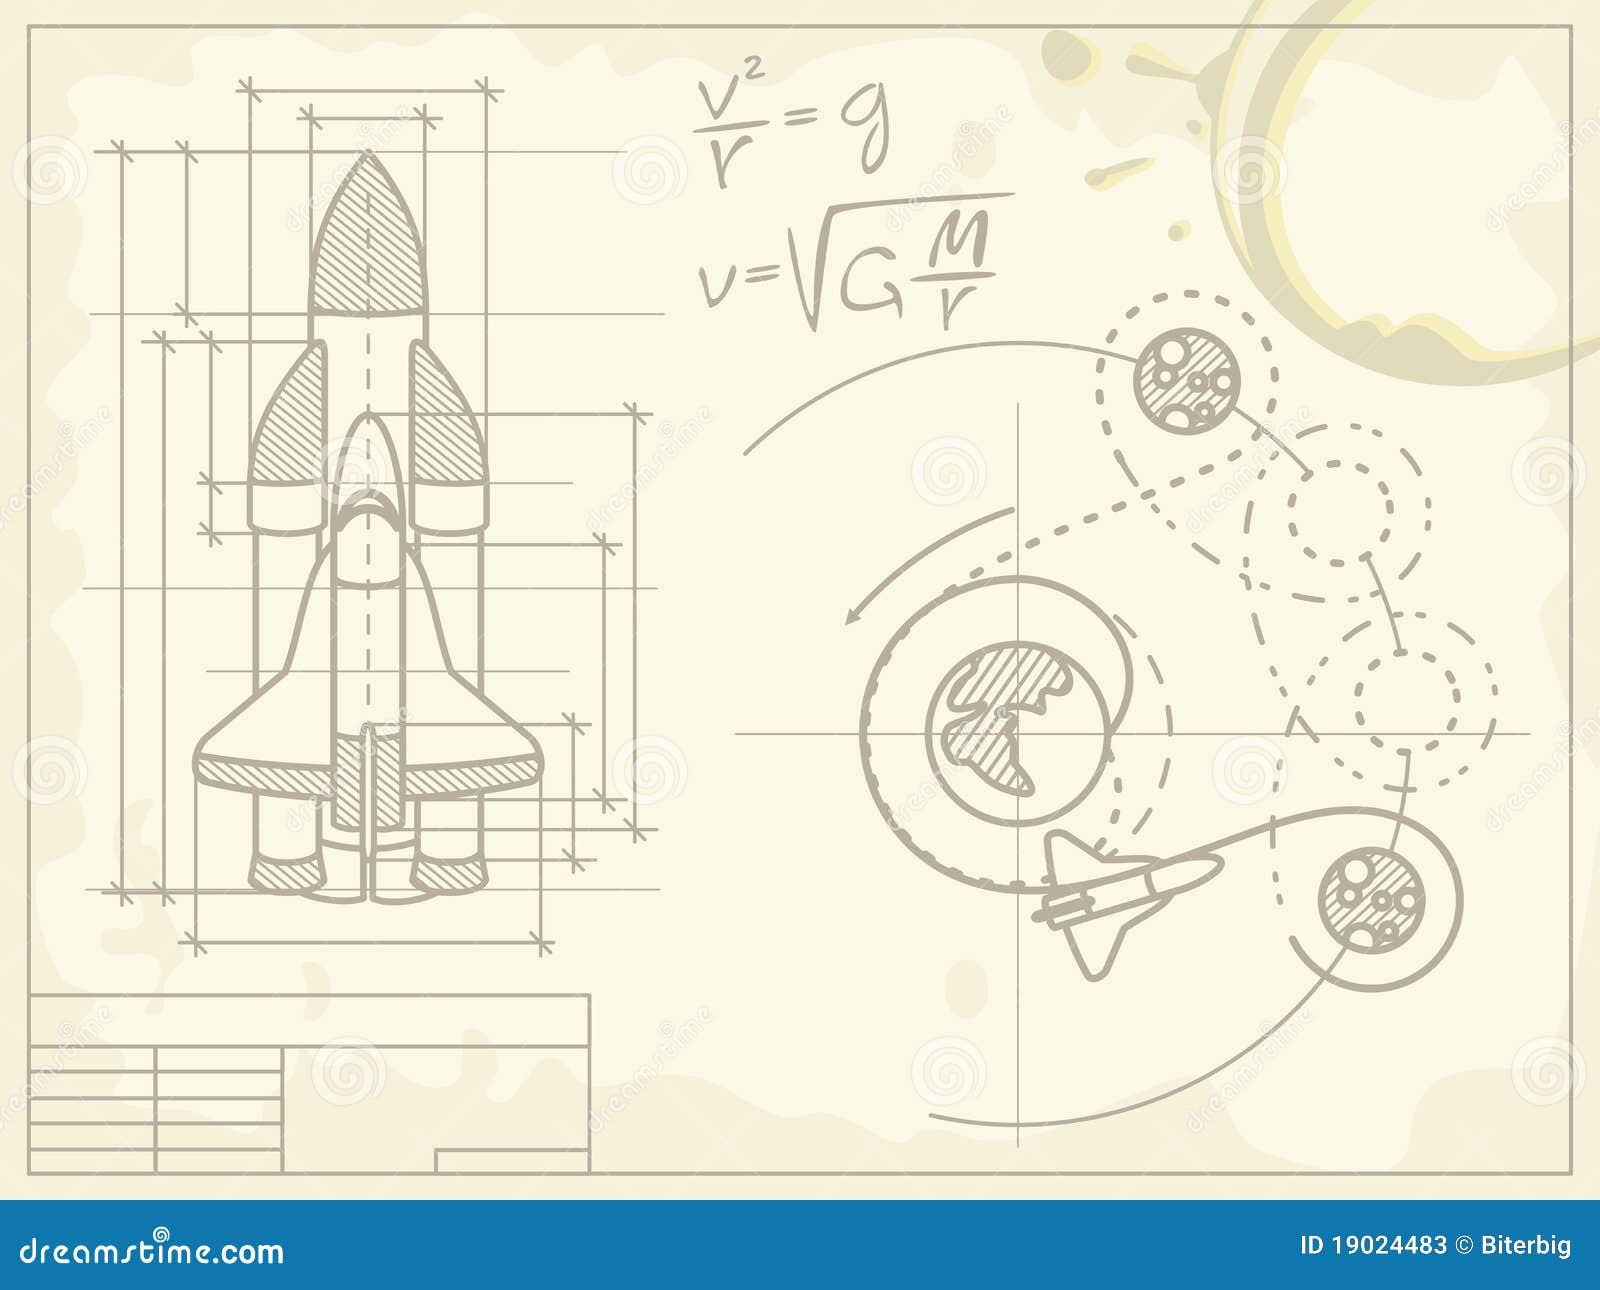 Blueprint of the spaceship and its flight path stock vector download blueprint of the spaceship and its flight path stock vector illustration of grunge malvernweather Choice Image